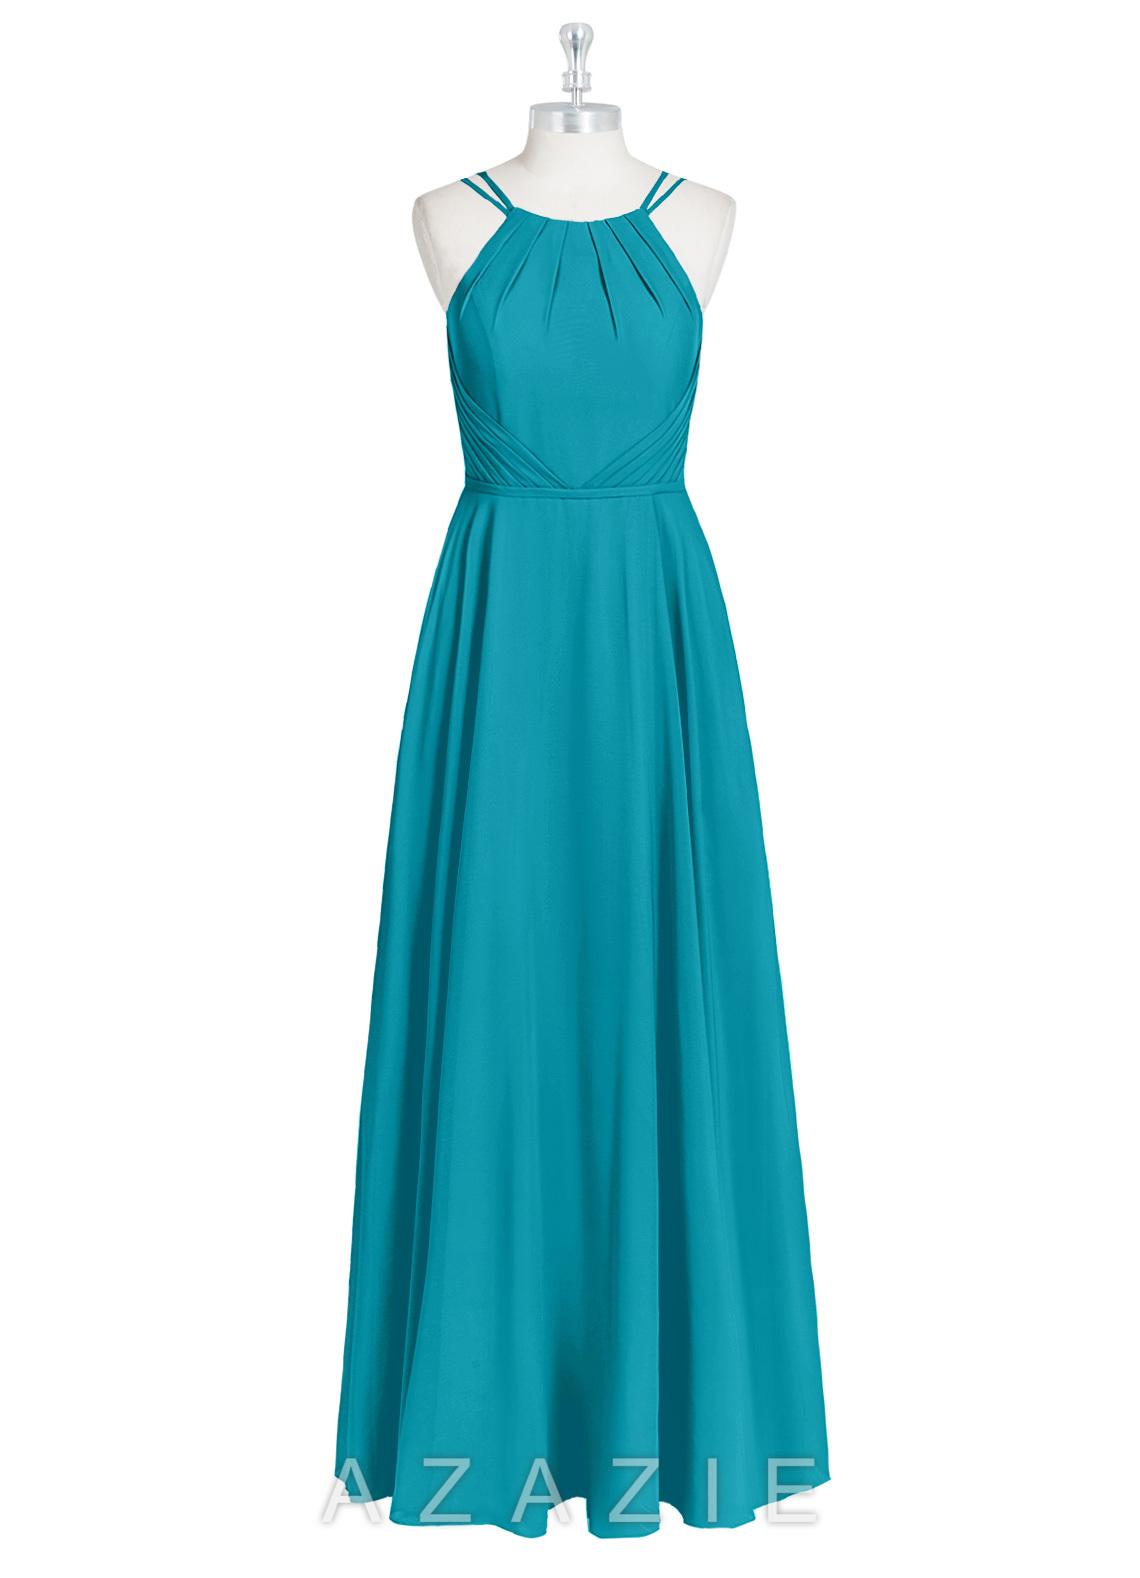 Jade Bridesmaid Dresses & Jade Gowns | Azazie